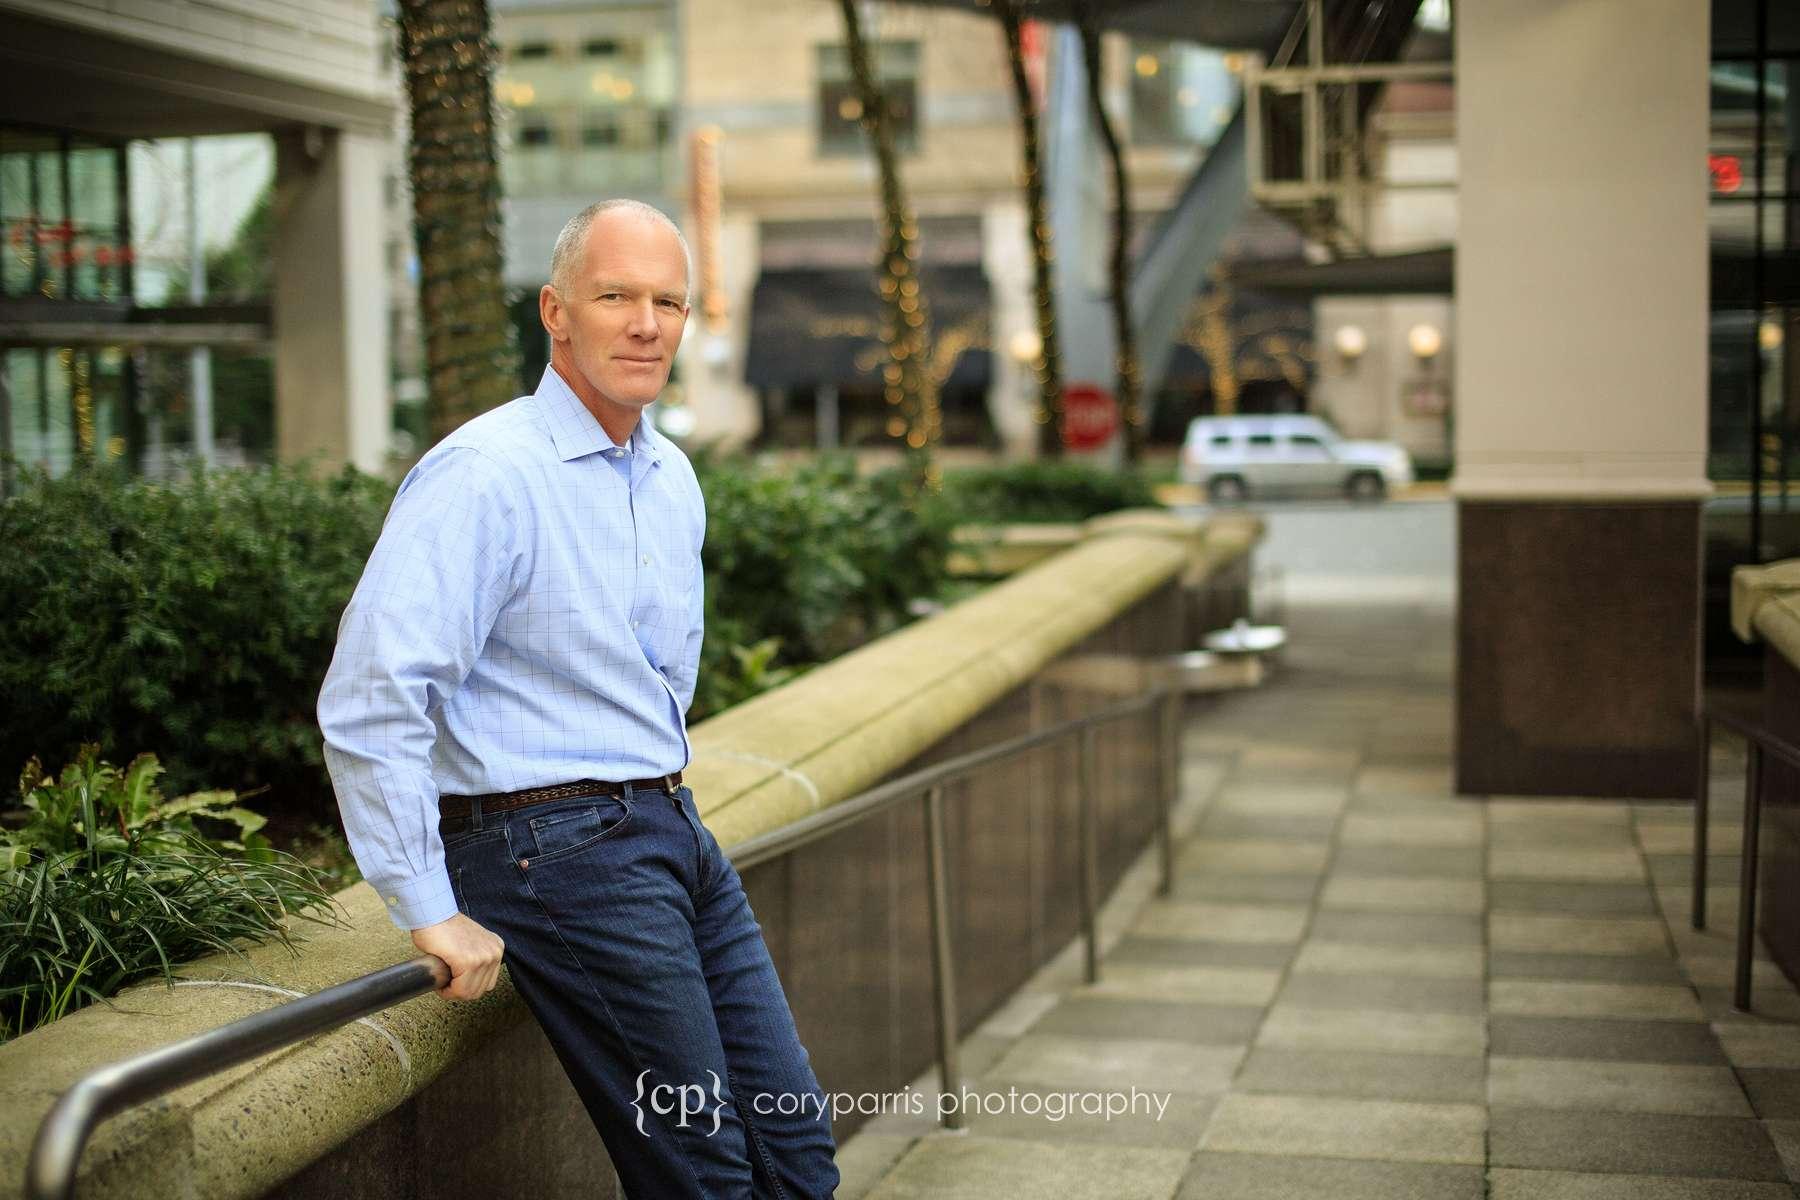 012-bellevue-business-portrait-headshot.jpg